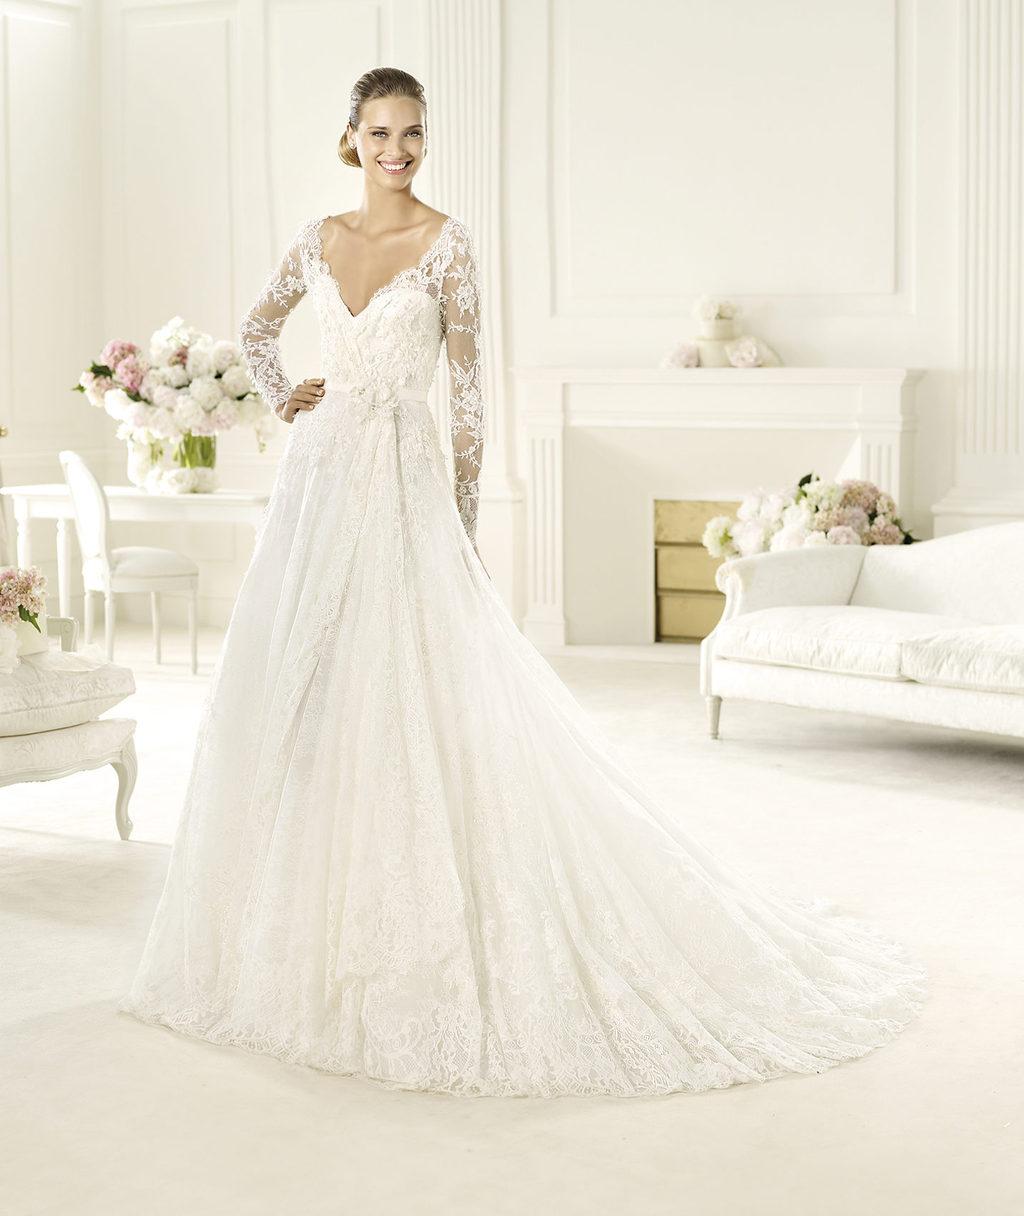 Elie Saab Wedding Dress 2014 Pronovias Bridal Birgit